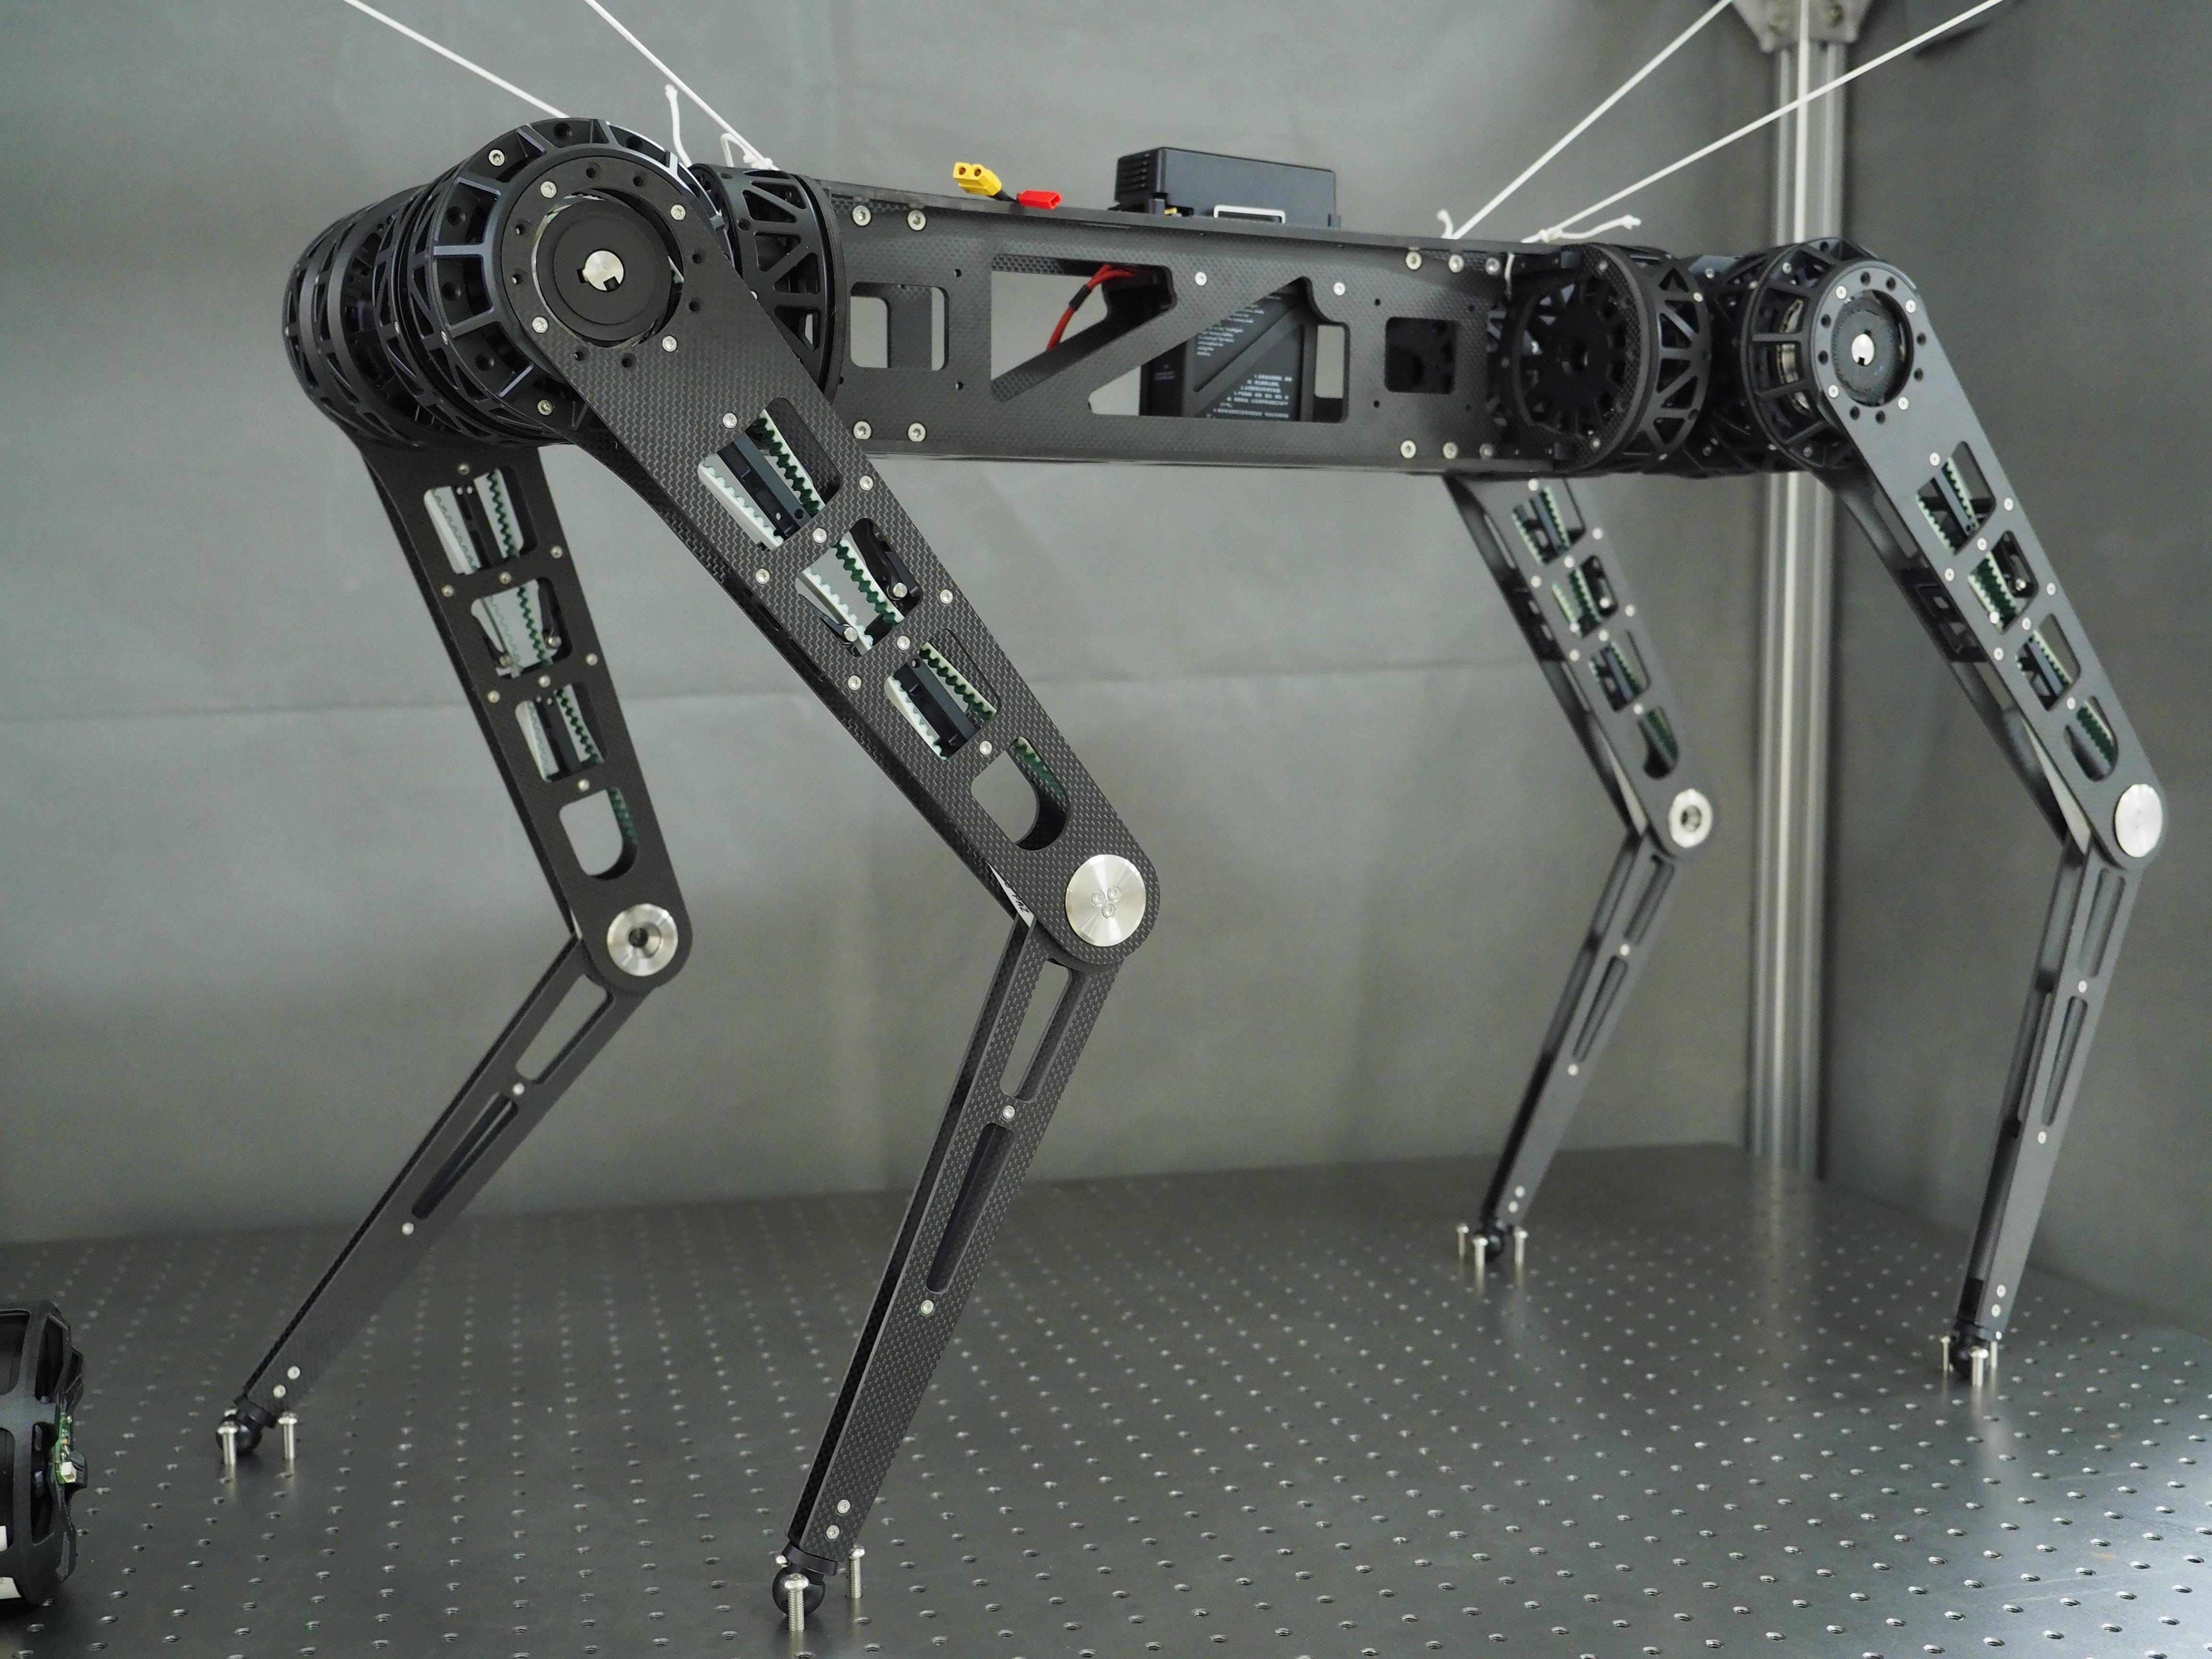 New Quadruped Robot 2019